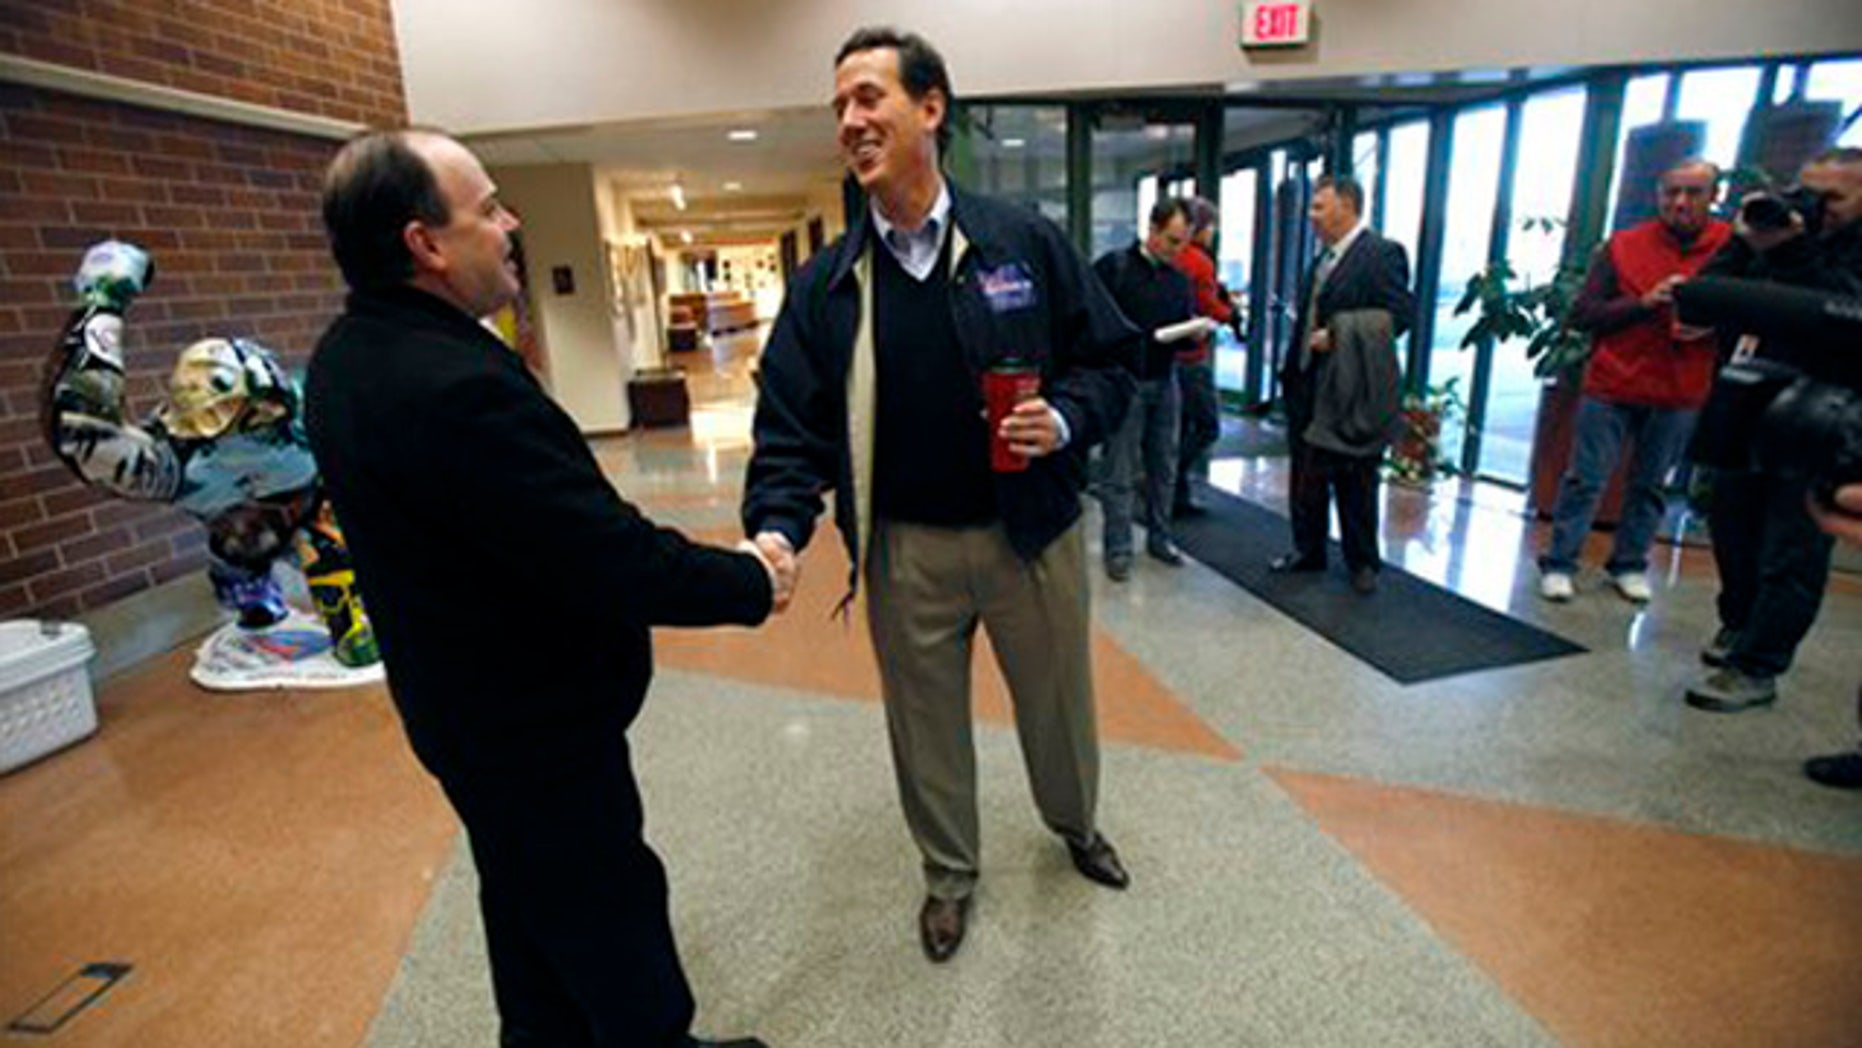 Dec. 29, 2011:  Rick Santorum arrives at a campaign stop in Coralville, Iowa.